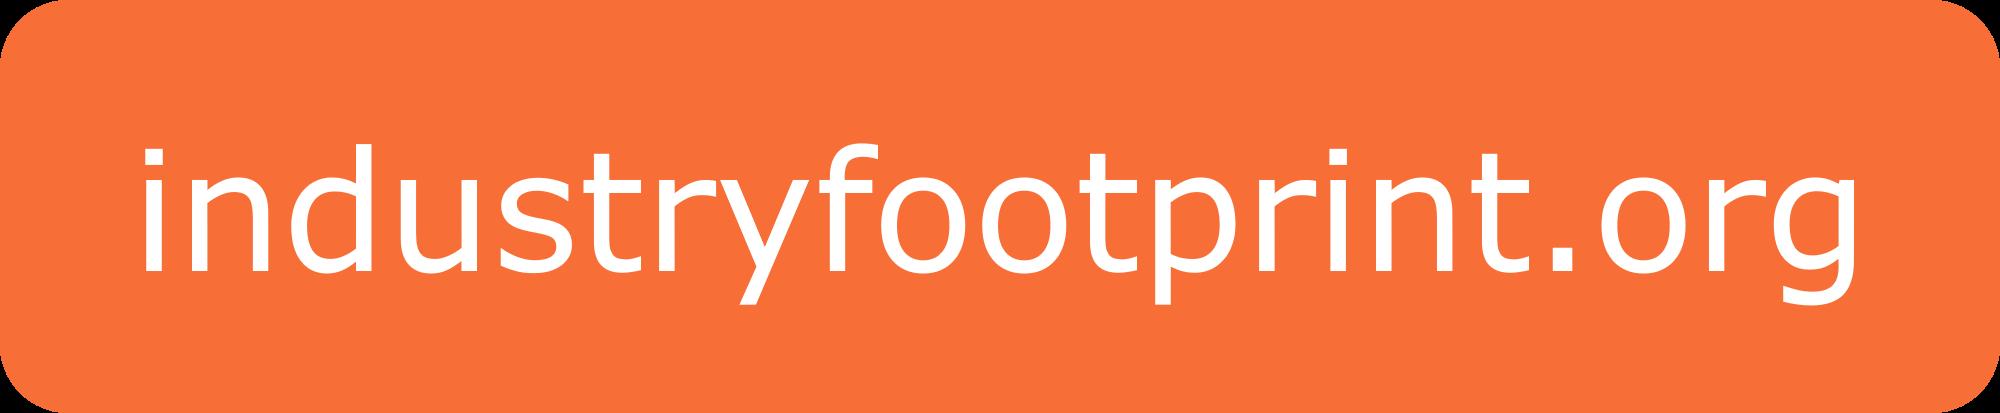 industryfootprint.org